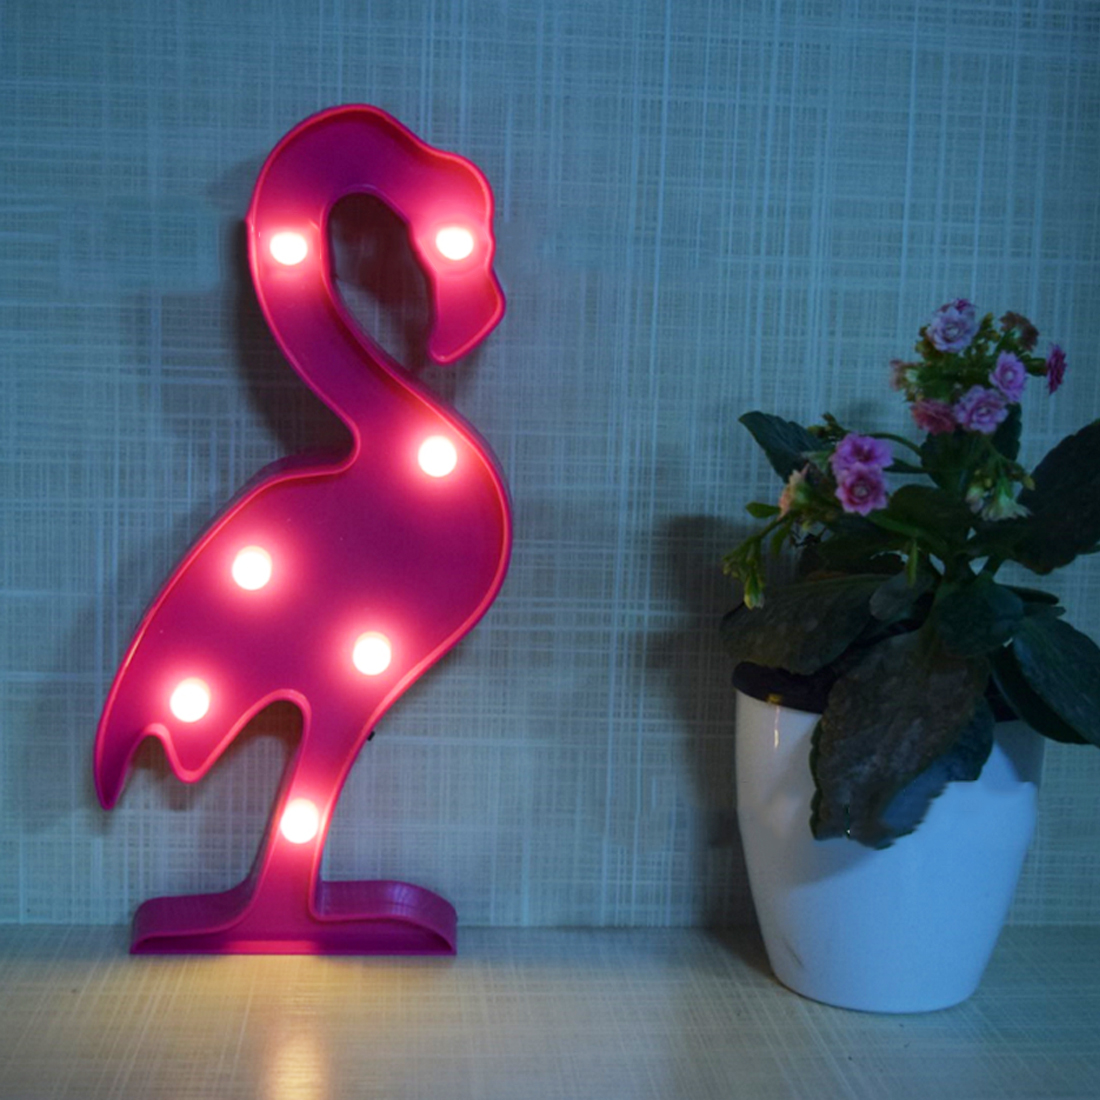 Luminary 3D LED Flamingo Lamp Pineapple Cactus Clouds Nightlight Romantic Light Table Lamp For Christmas Decorations Home Decor